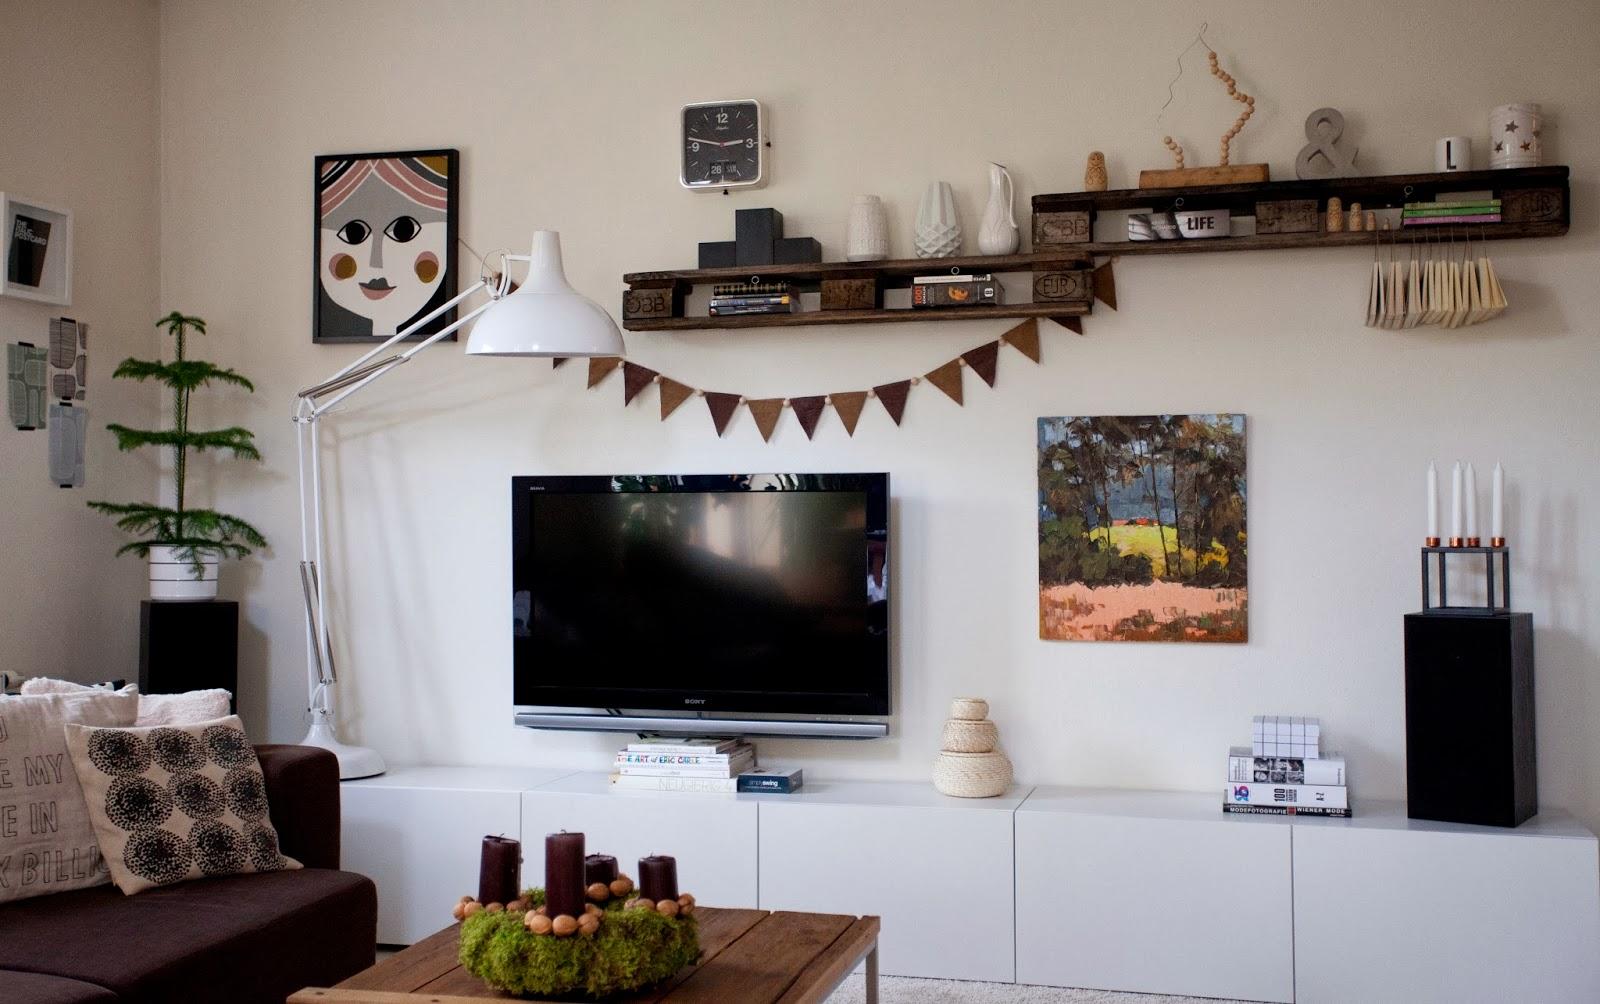 diy inspiration das 100 posting oder unser neues upcycling paletten regal eine wimpelkette. Black Bedroom Furniture Sets. Home Design Ideas